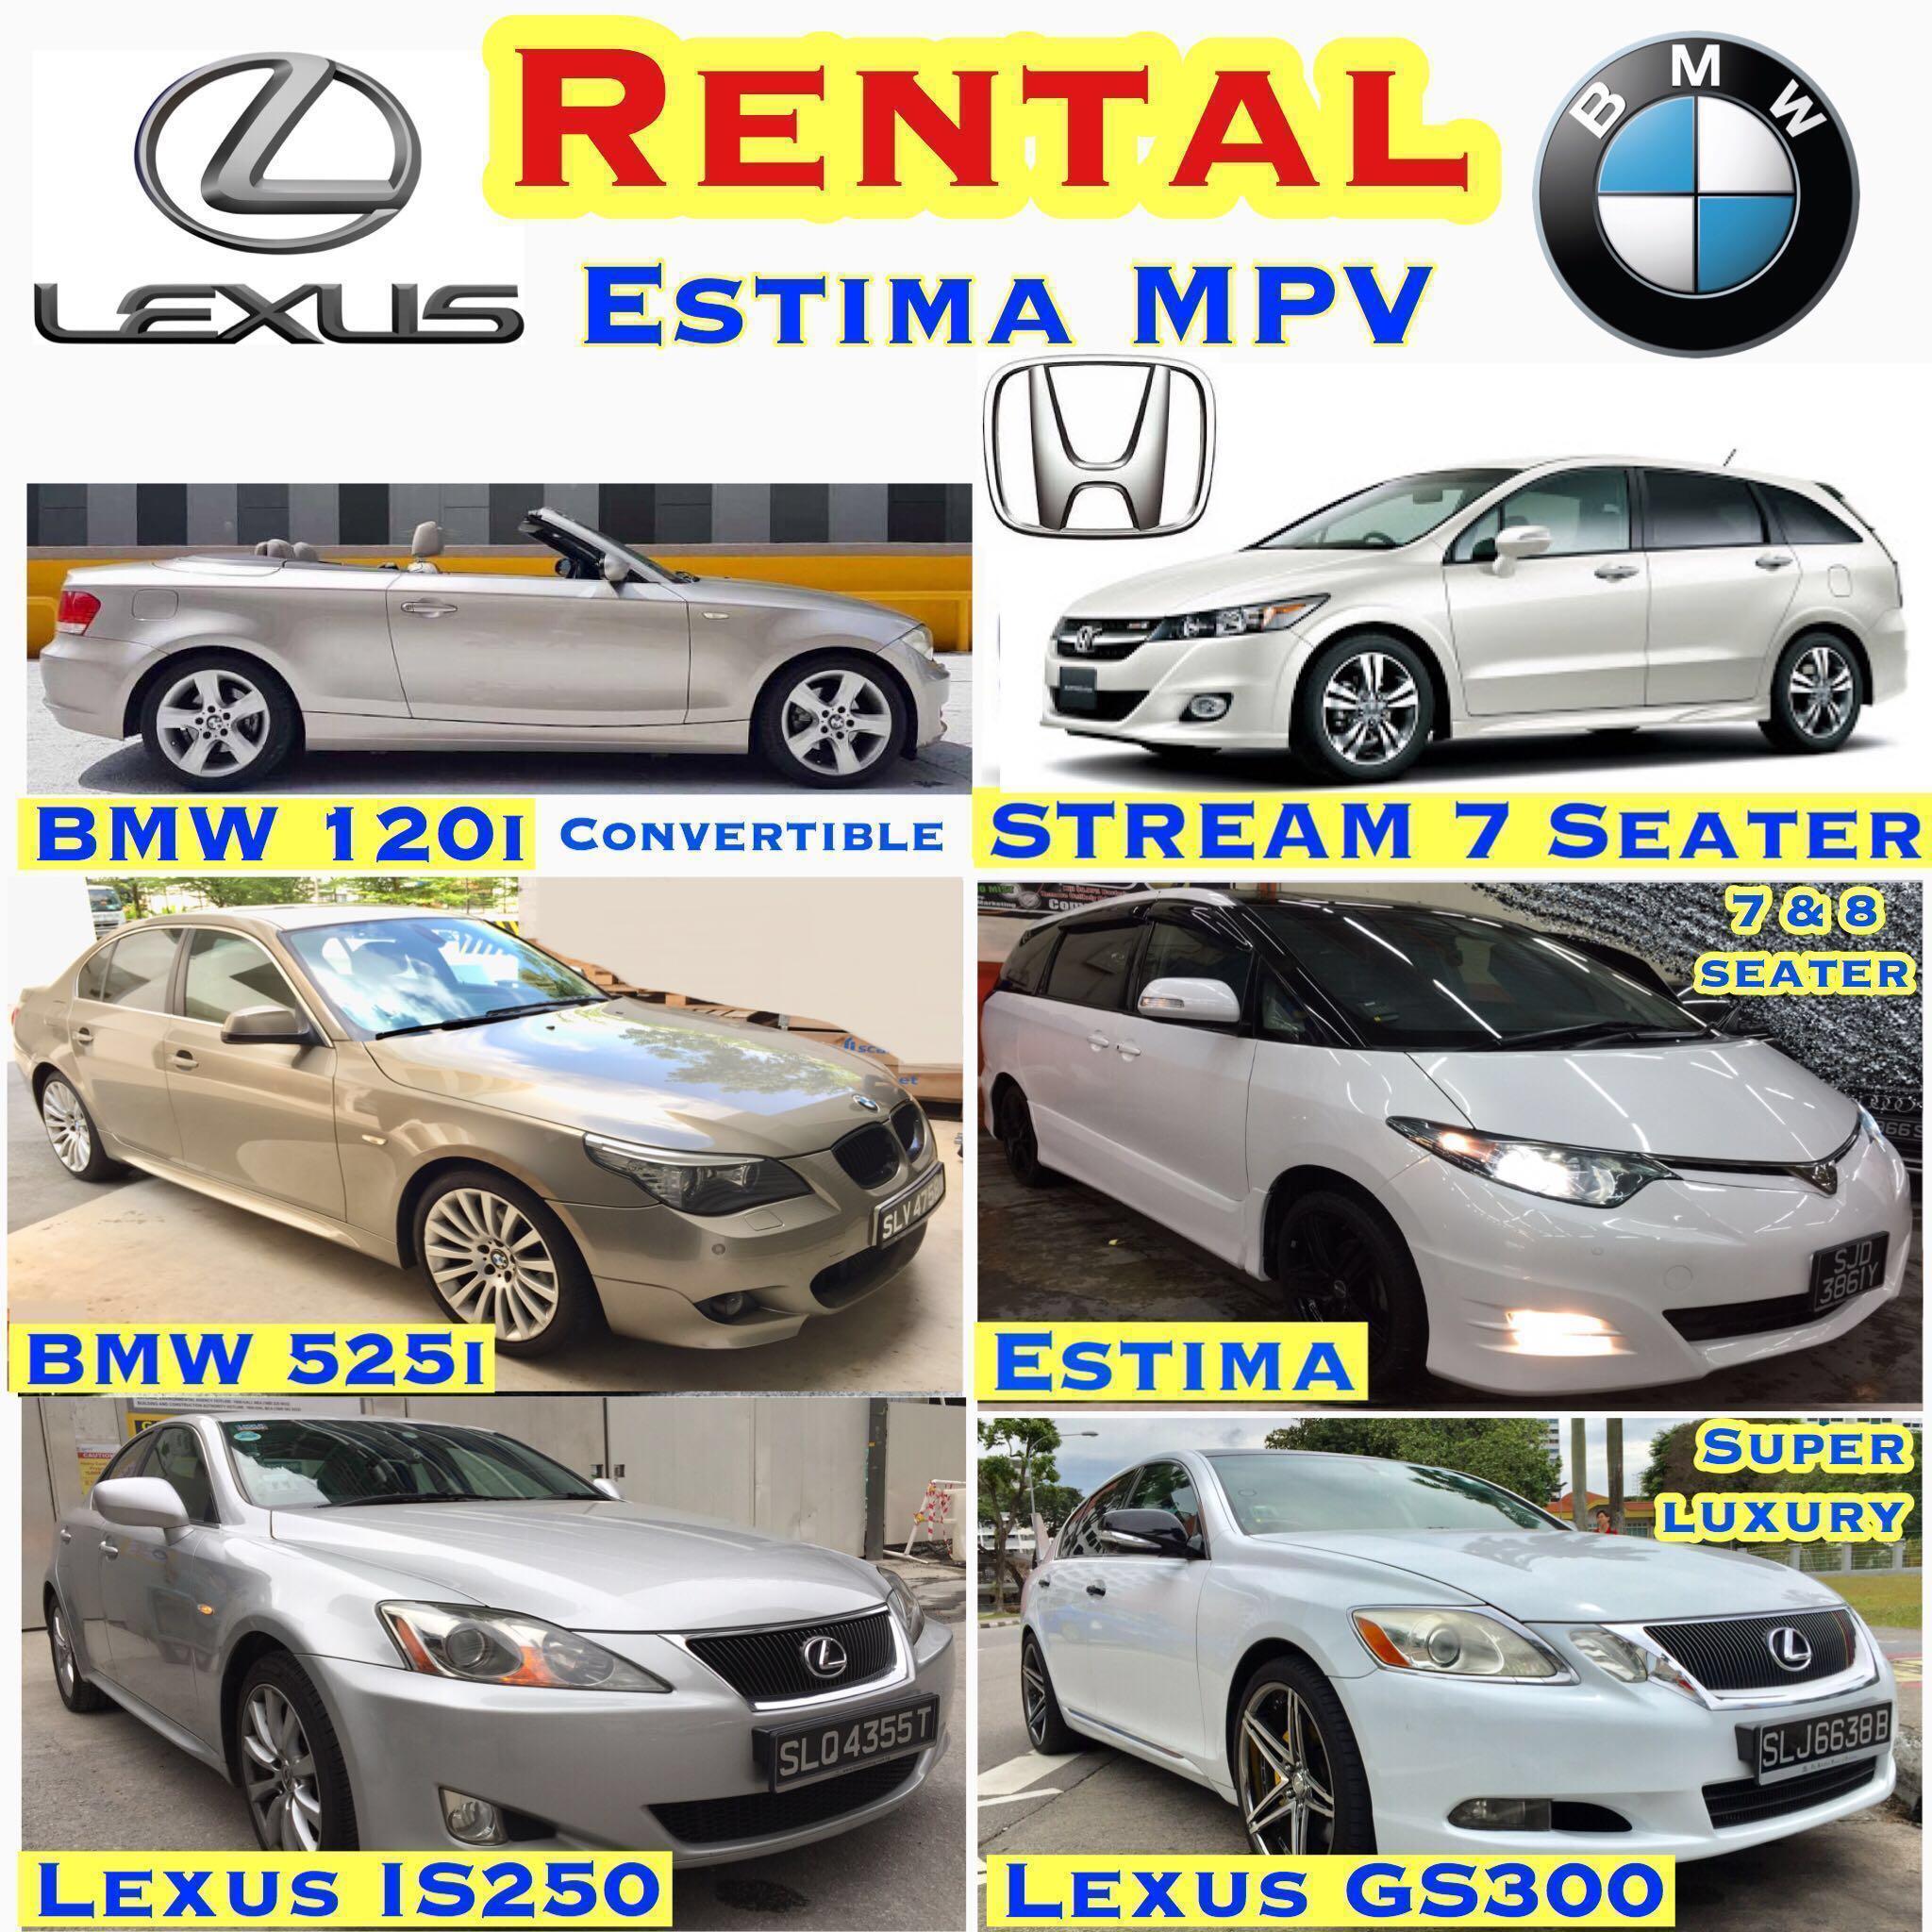 Cheapest Car To Lease >> Cheapest Car Rental Lease Estima Mpv 69 Vezel Hybrid 69 Honda Accord 49 Stream 49 Lexus Is250 59 Lexus Super